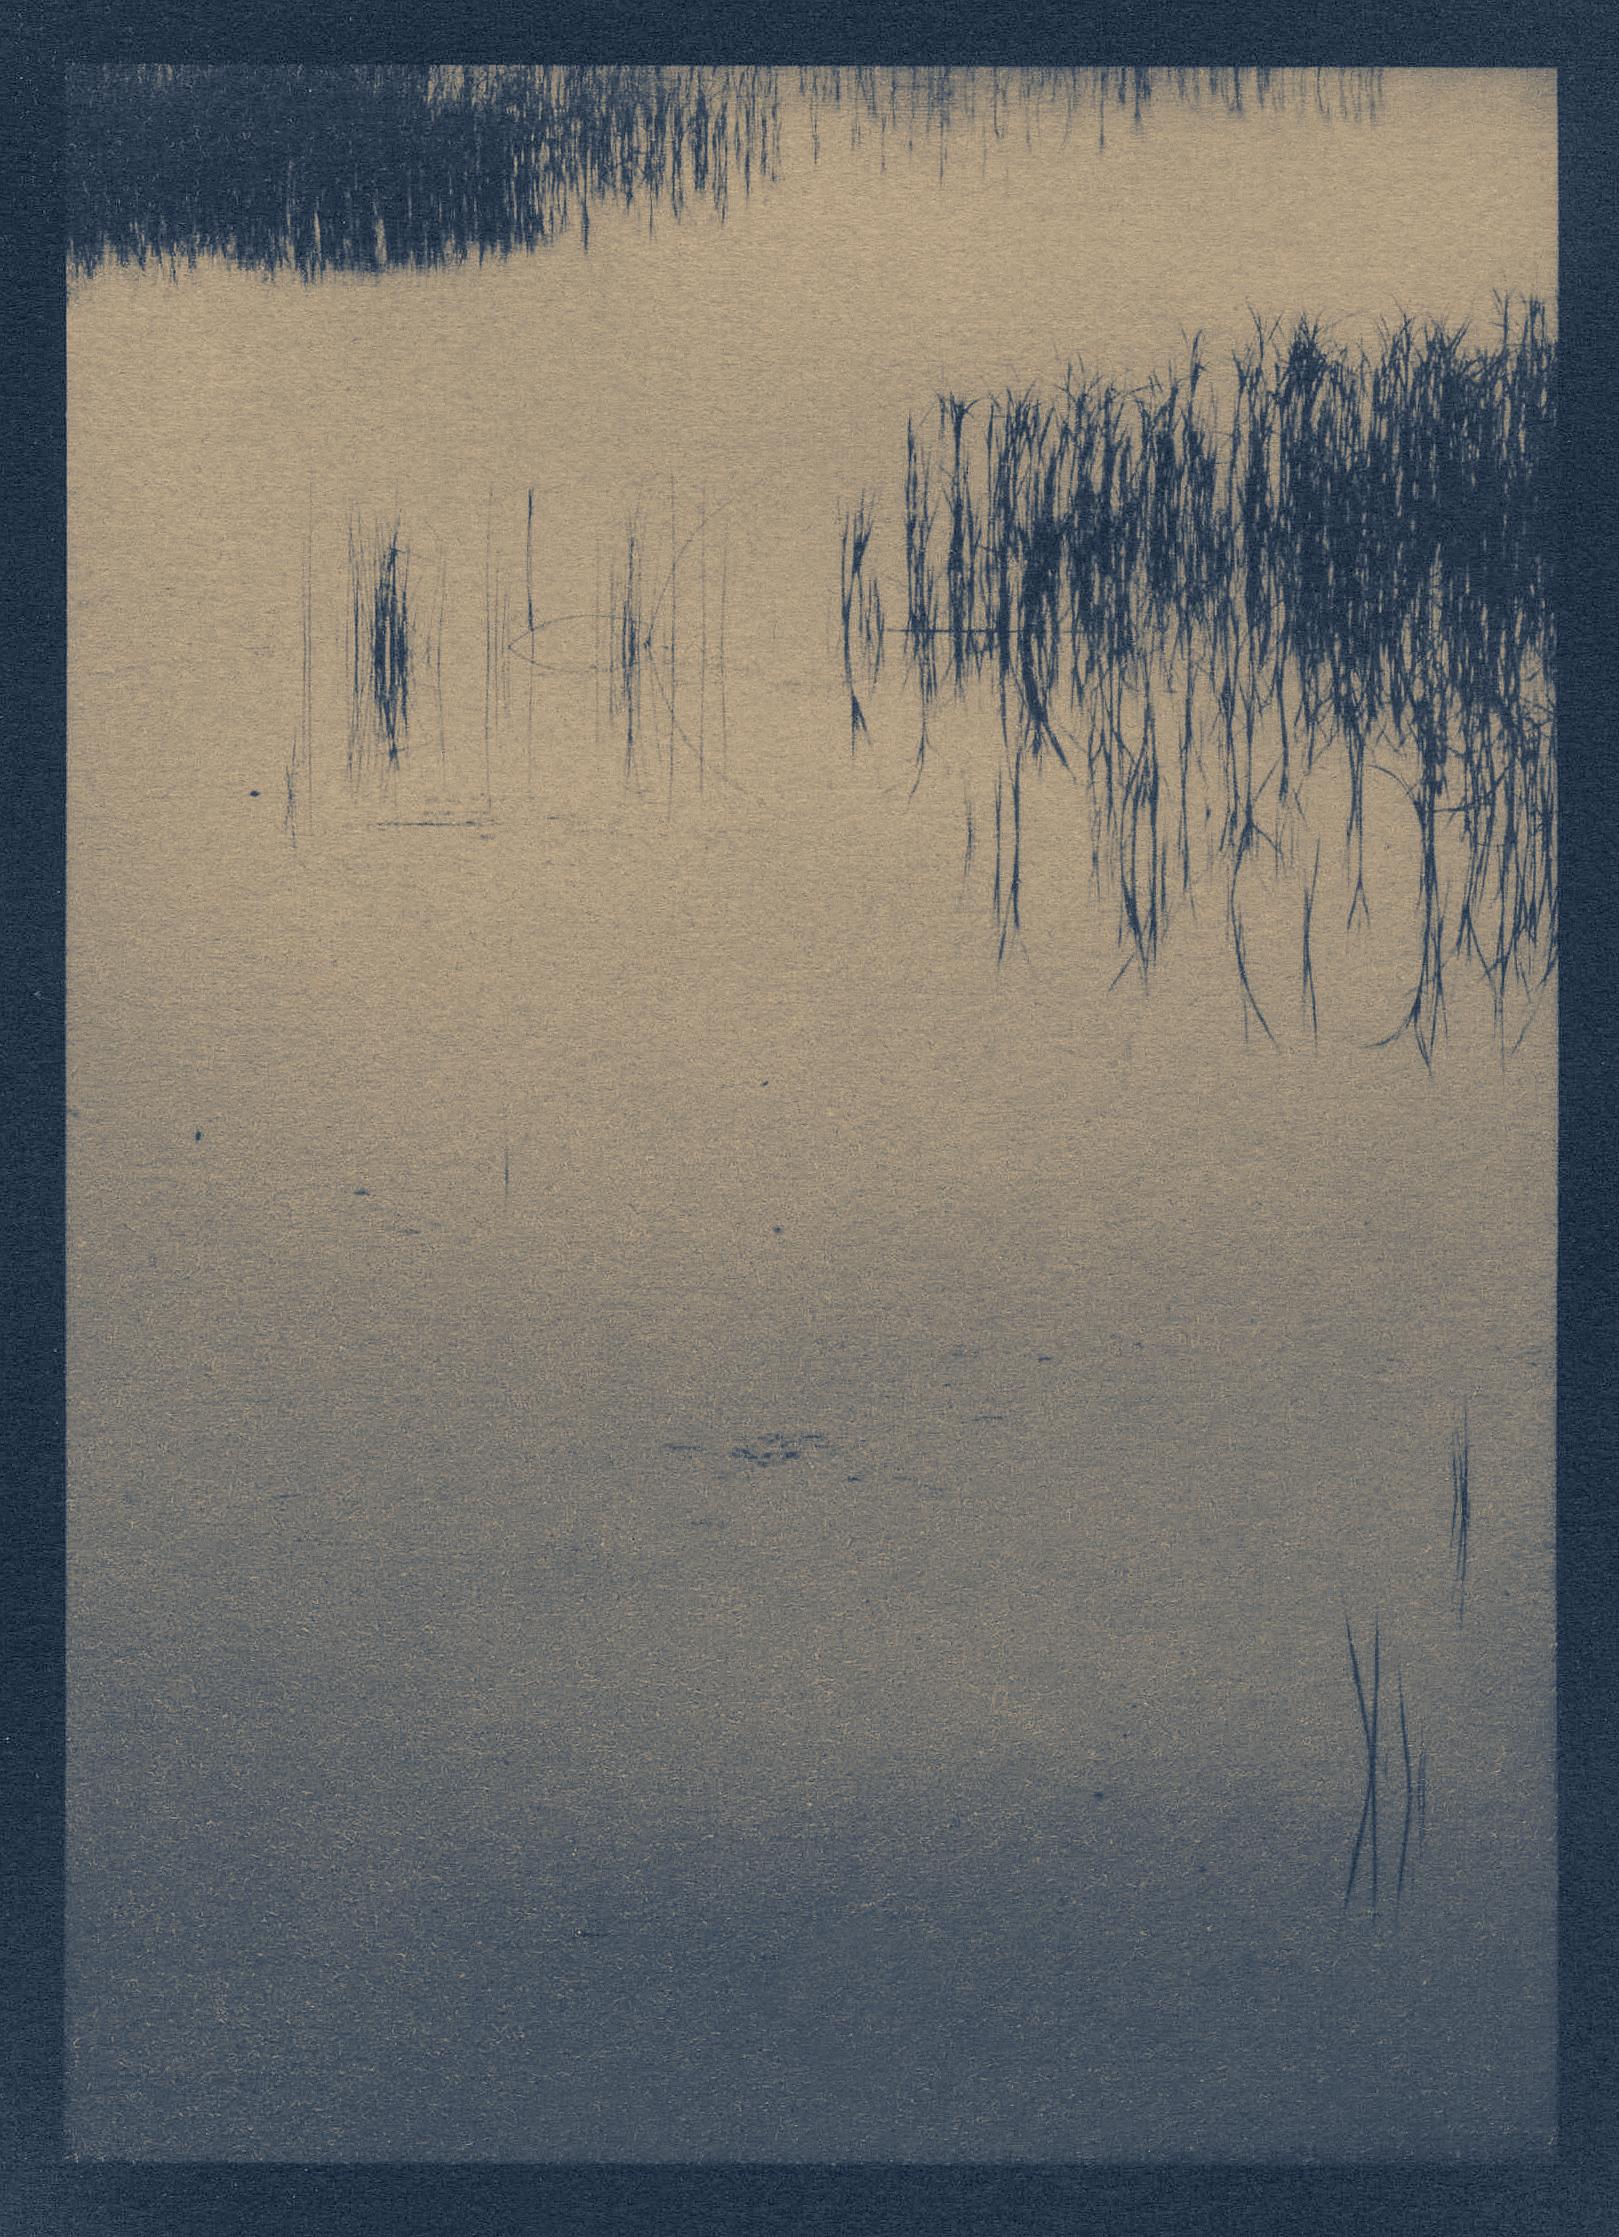 nahant_black_tea_toned_cyanotype 1039.jpg